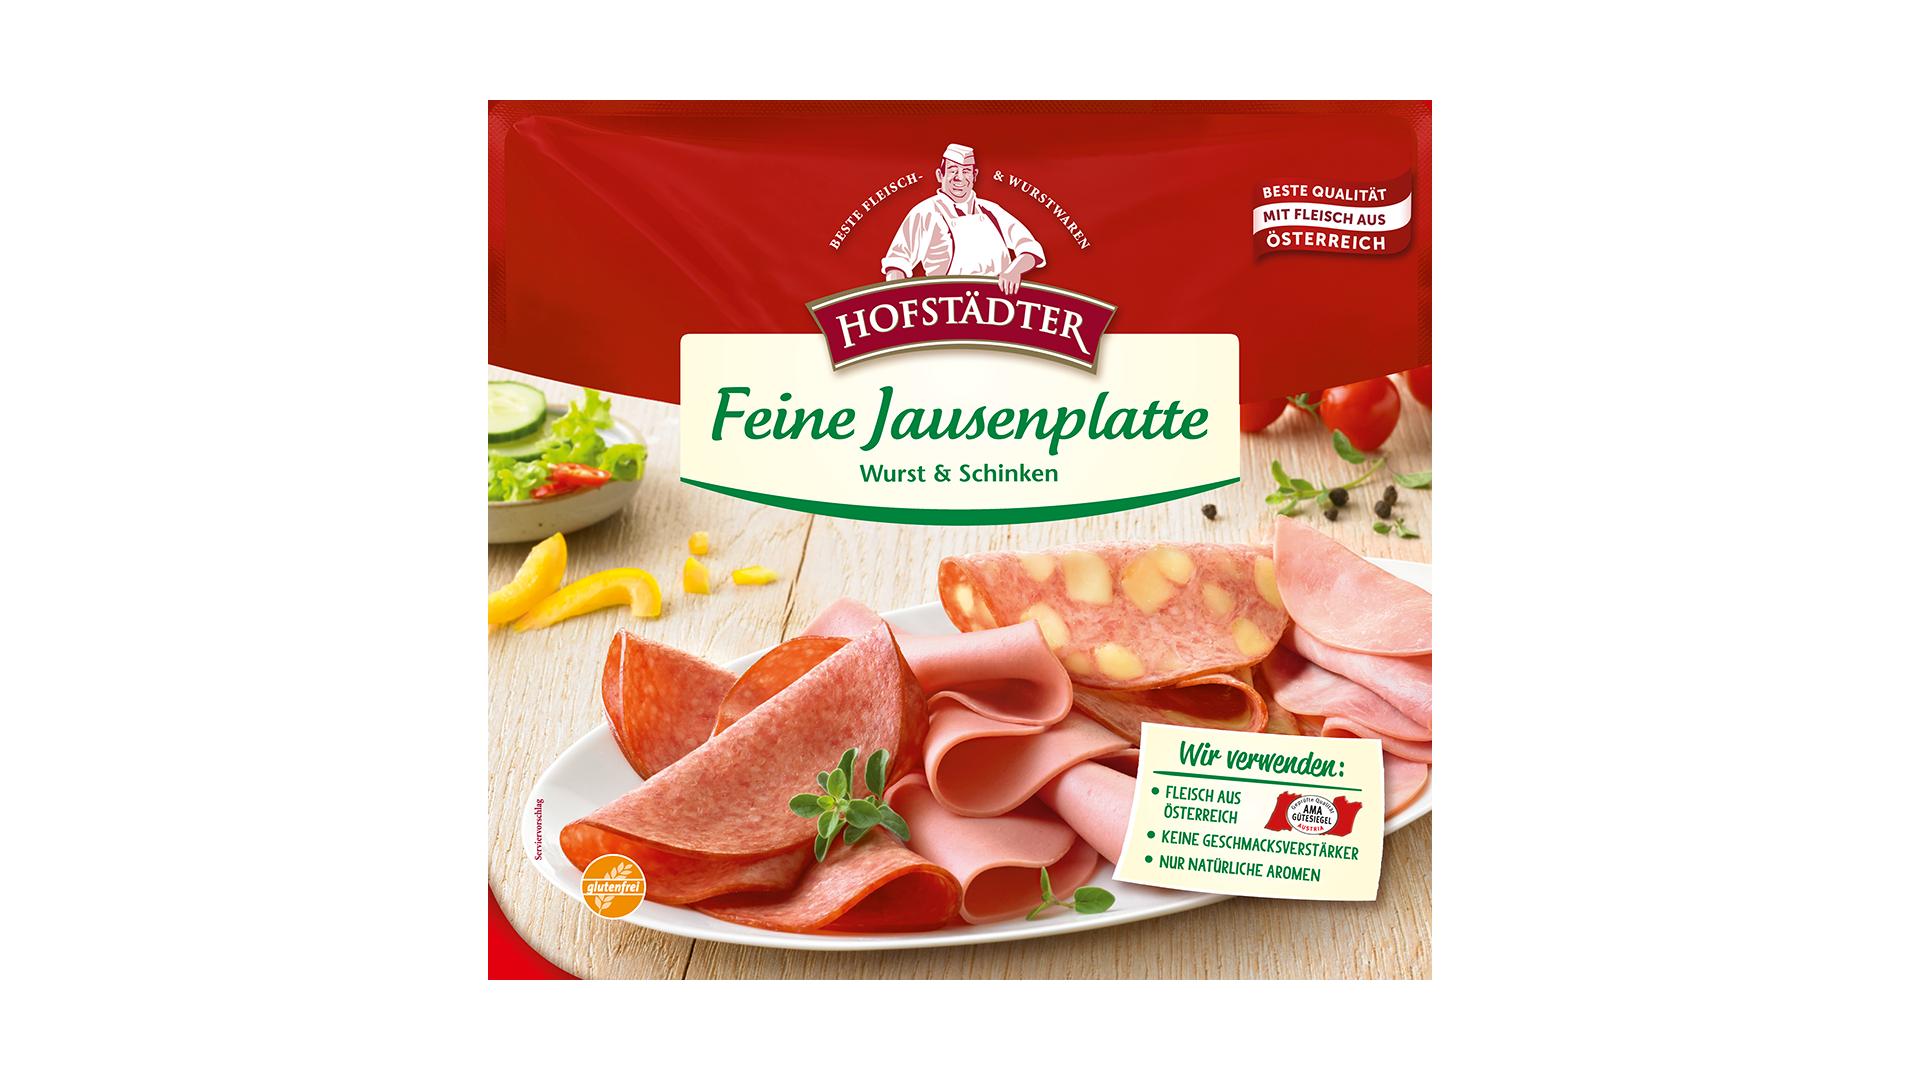 Hofstädter Feine Jausenplatte